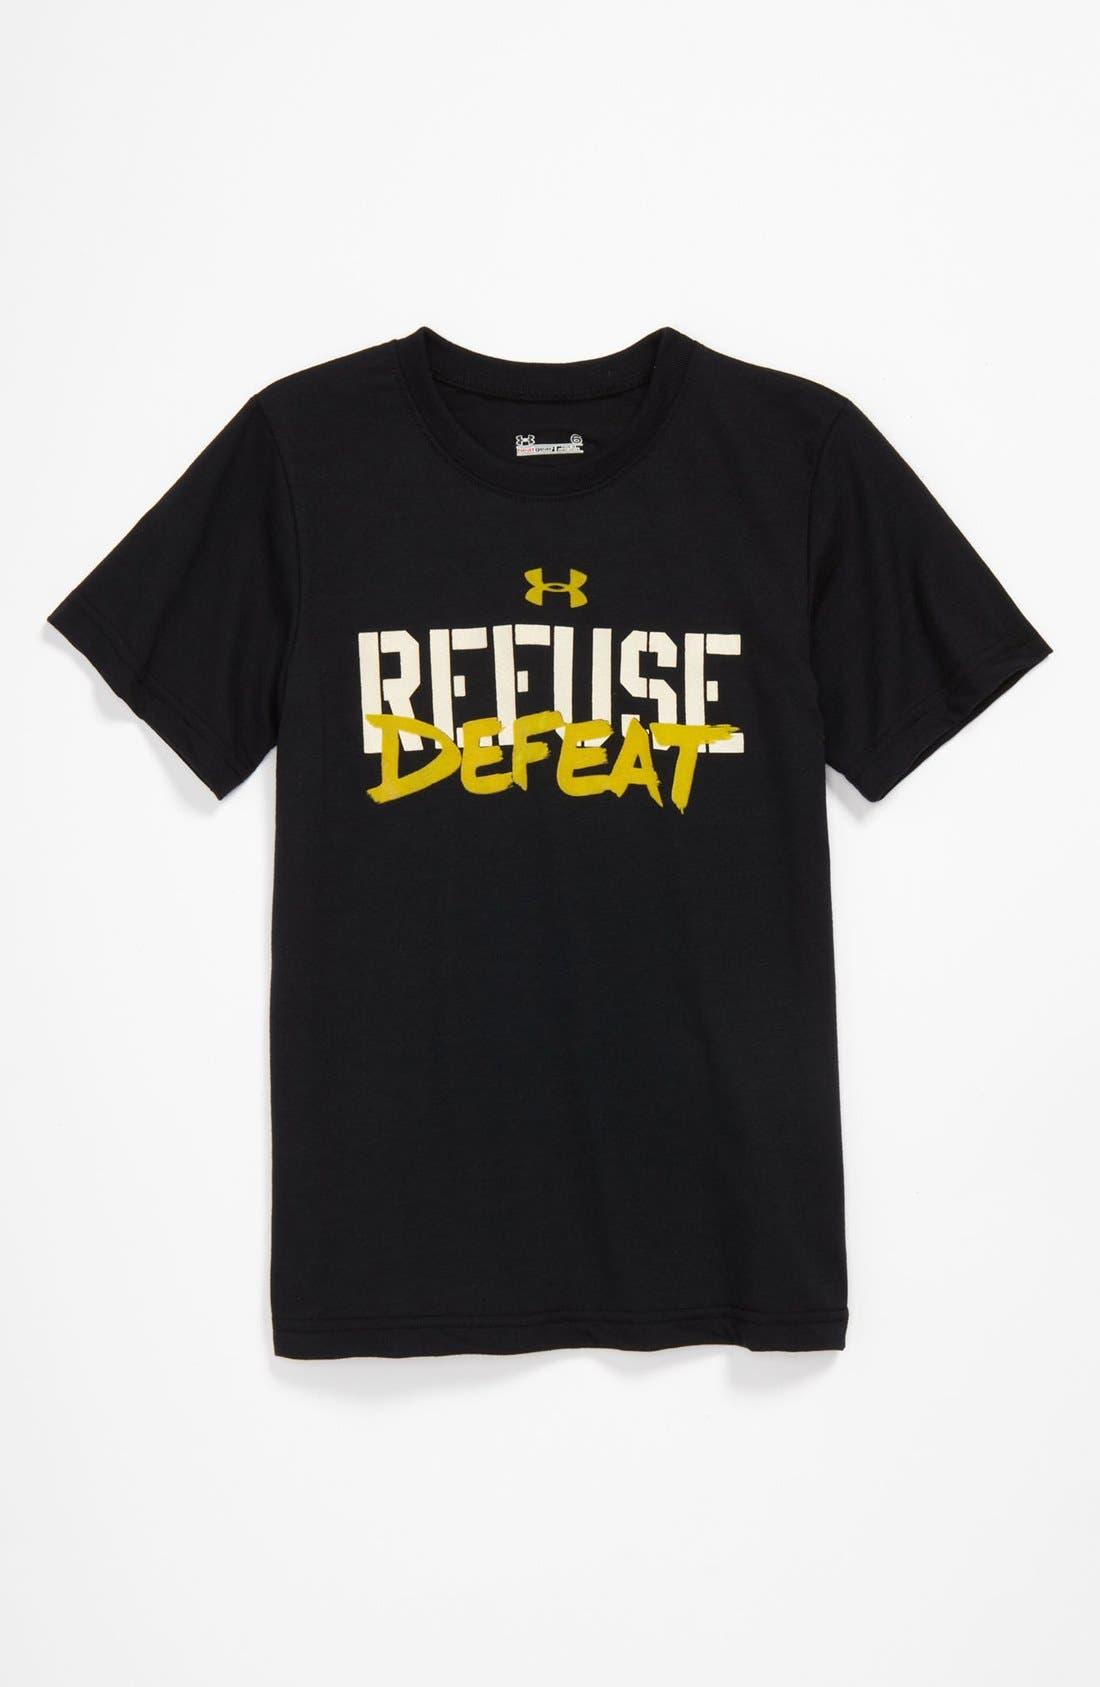 Main Image - Under Armour 'Refuse Defeat' T-Shirt (Little Boys)